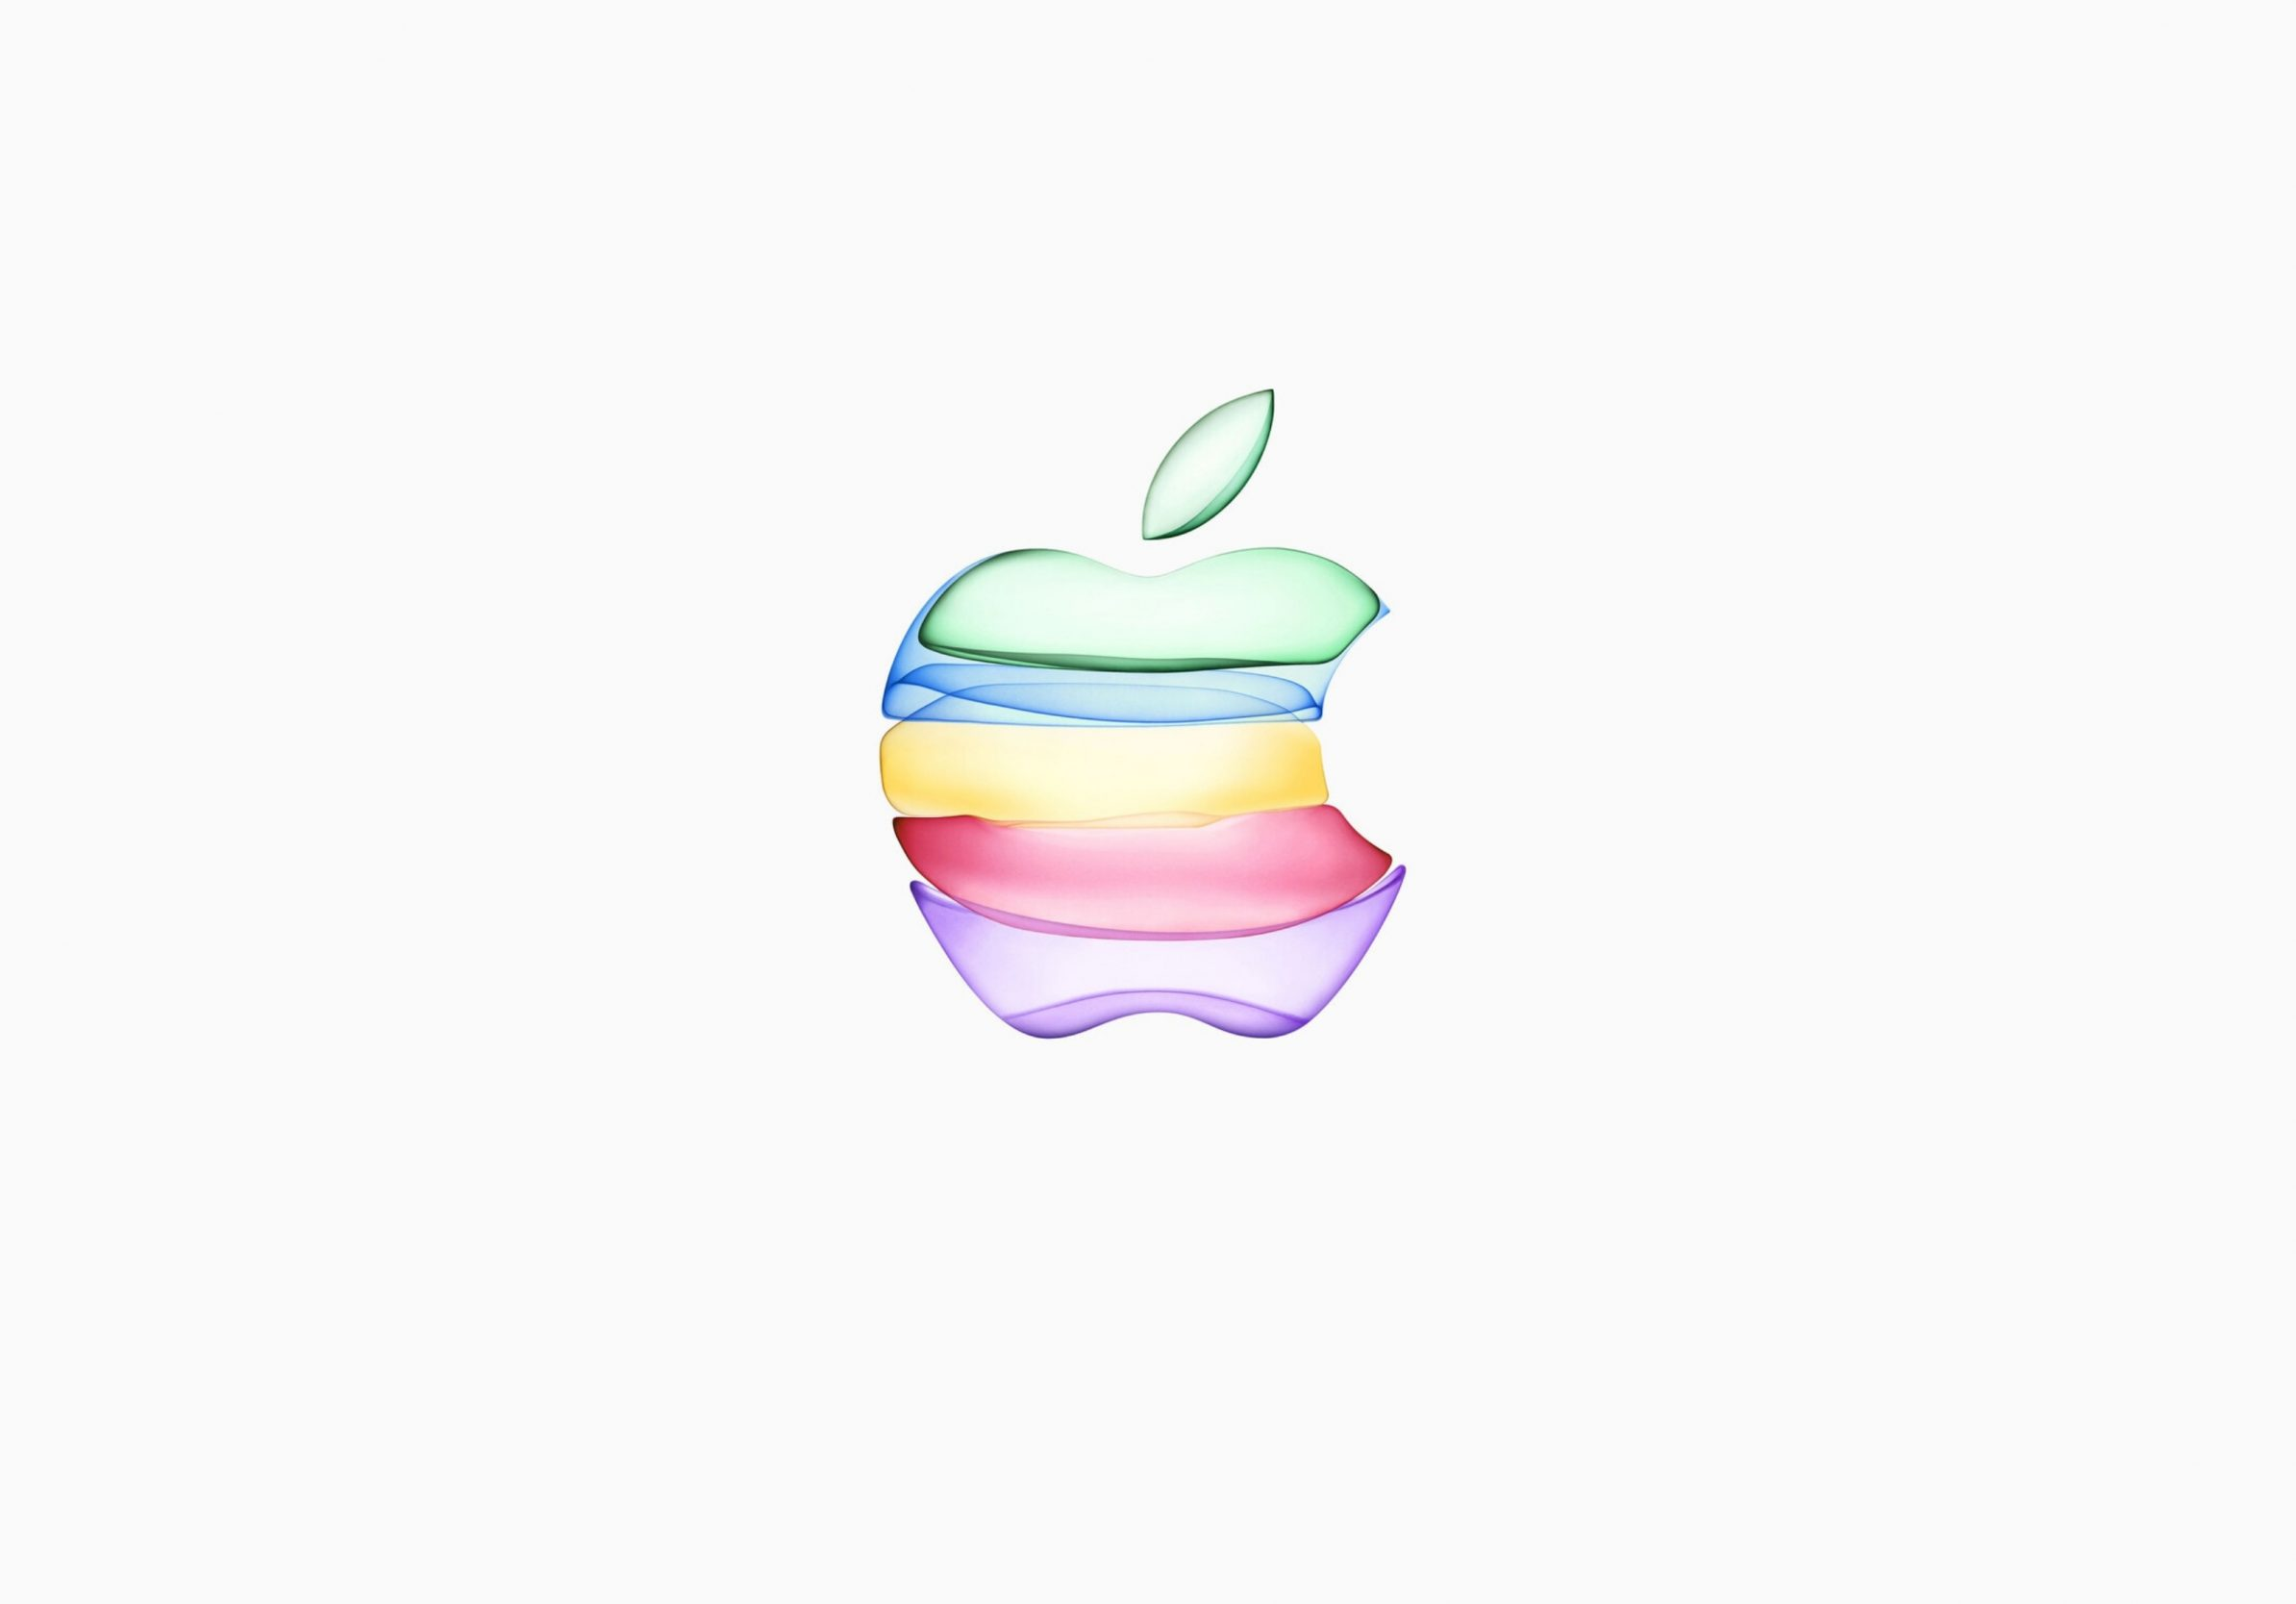 2388x1668 iPad Pro wallpapers iPhone 11 Apple Logo White Background iPad Wallpaper 2388x1668 pixels resolution